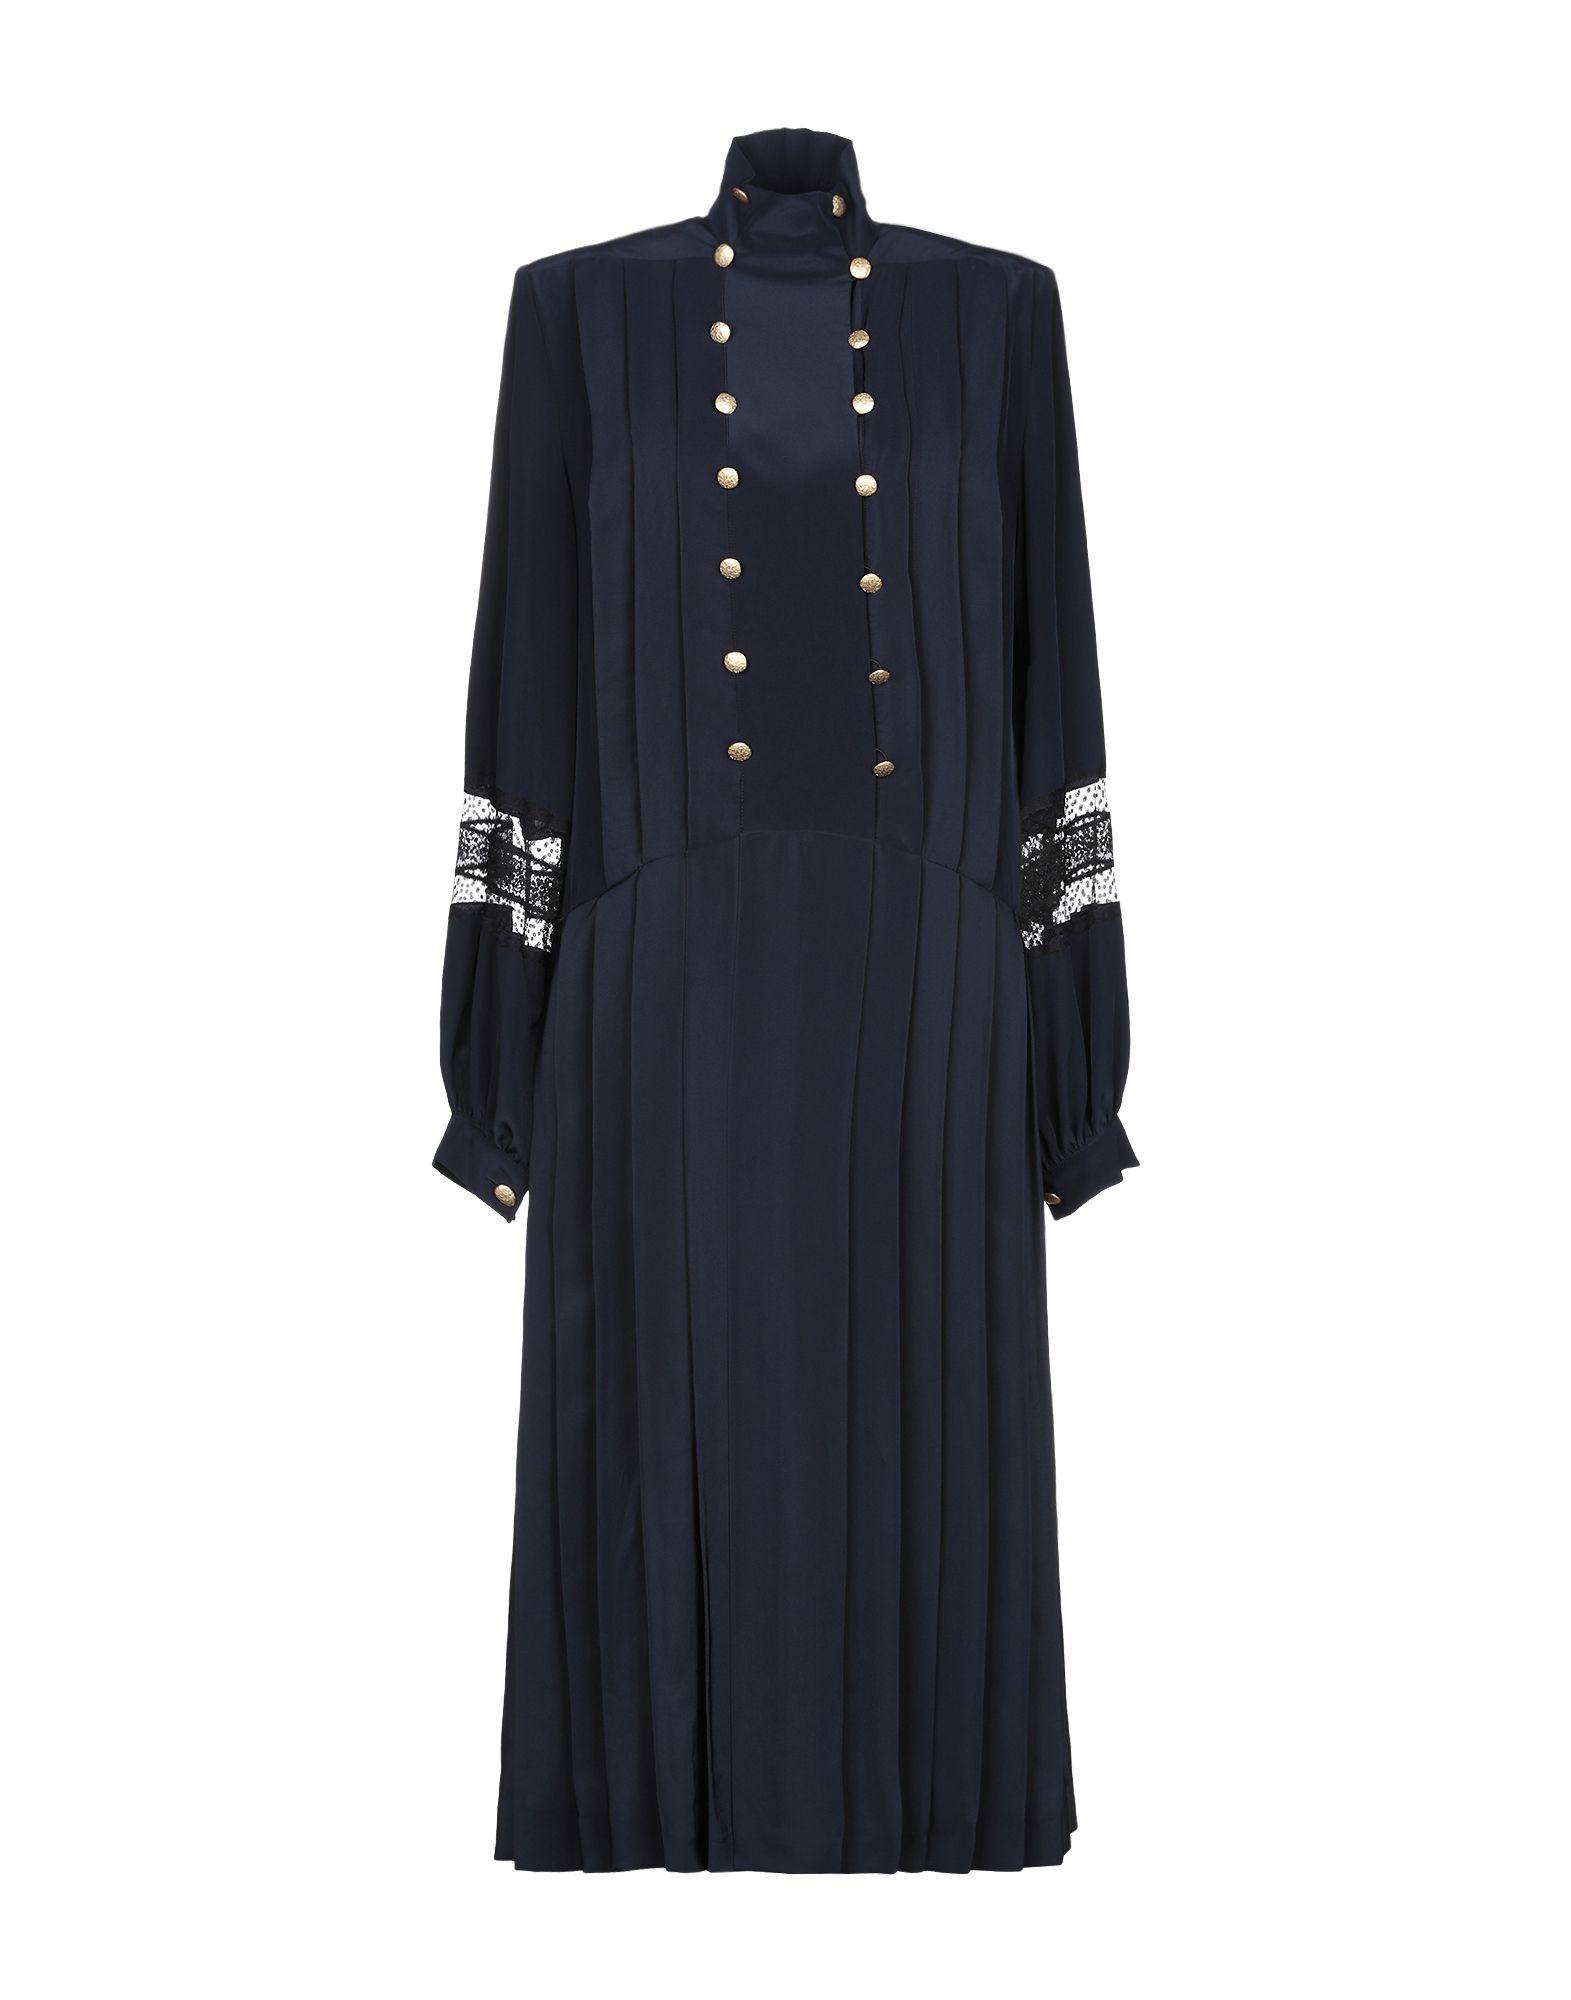 PHILOSOPHY di LORENZO SERAFINI Платье до колена le ragazze di st barth платье до колена